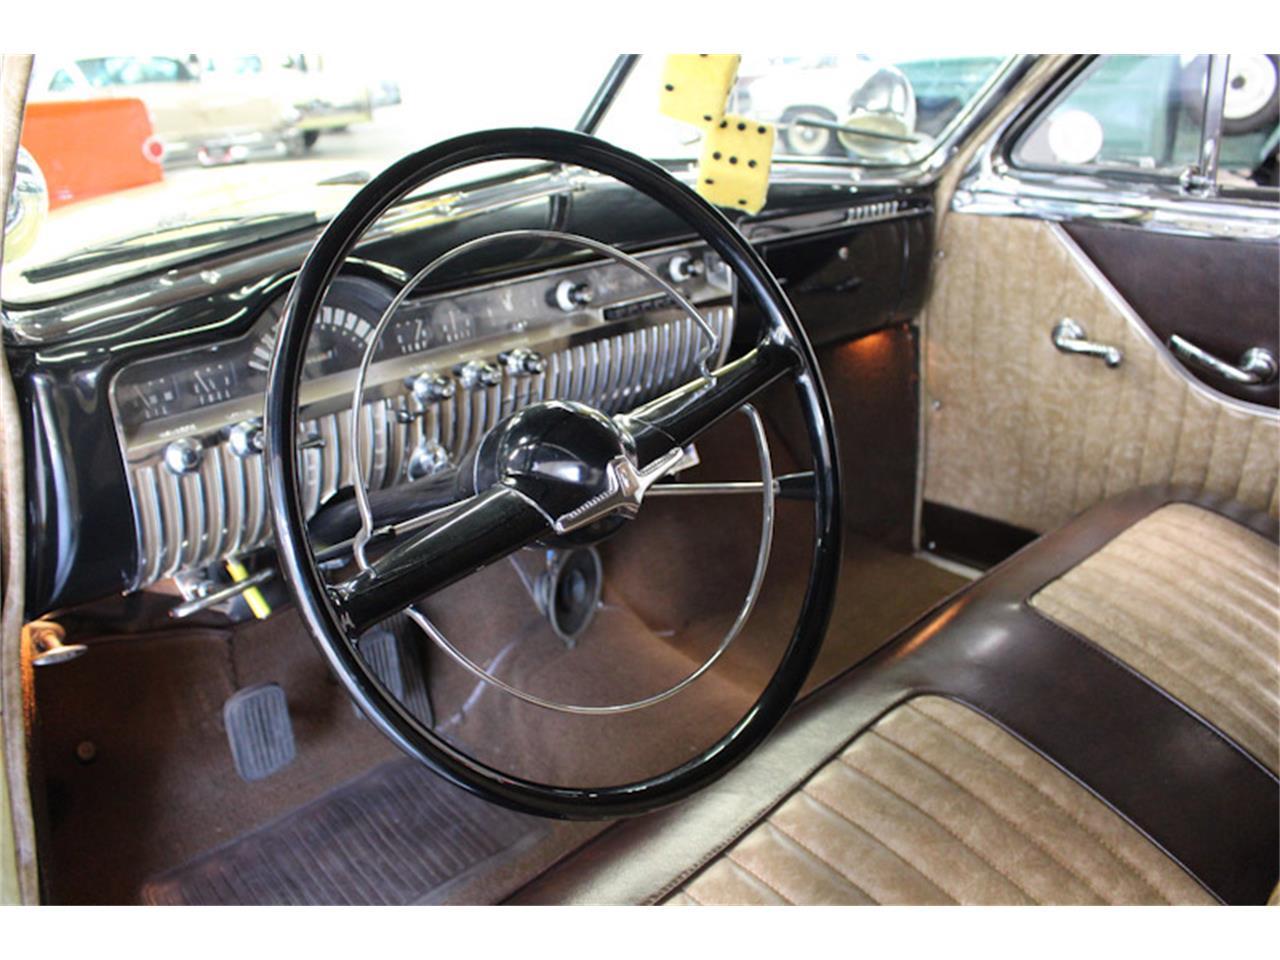 Large Picture of Classic '50 Mercury Hot Rod - $29,990.00 - OJFQ